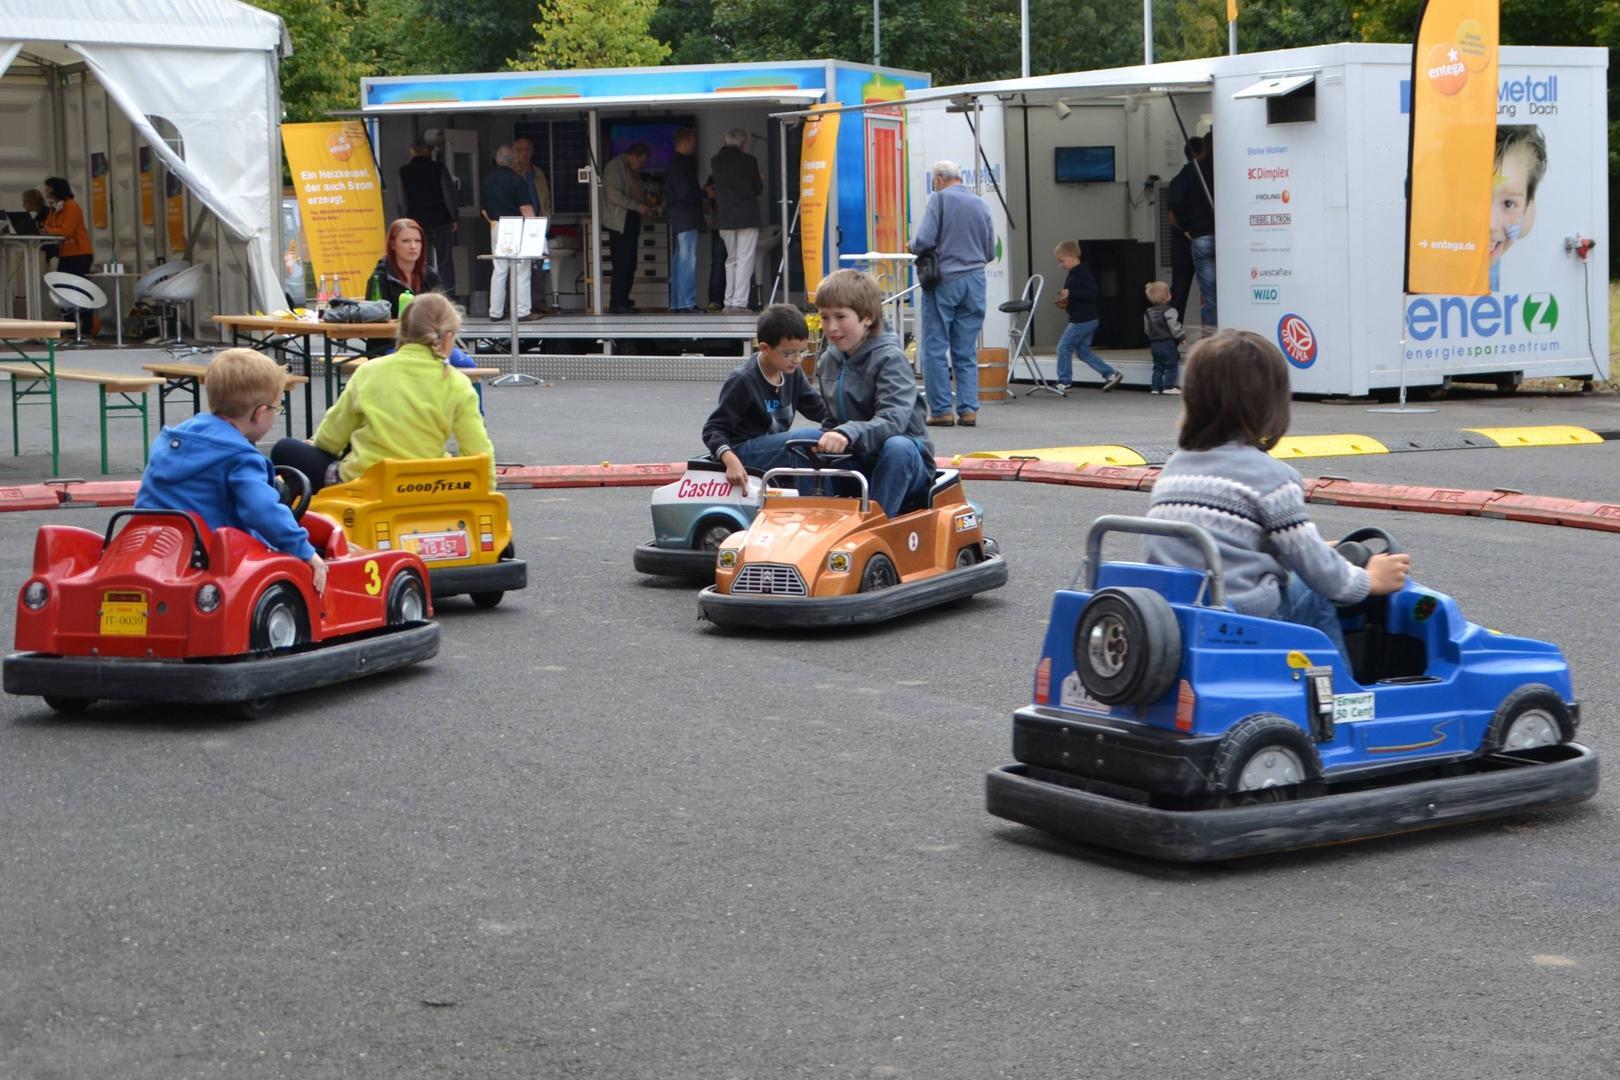 Karussell mieten & vermieten - Kinderkettenkarussell in Lehrte